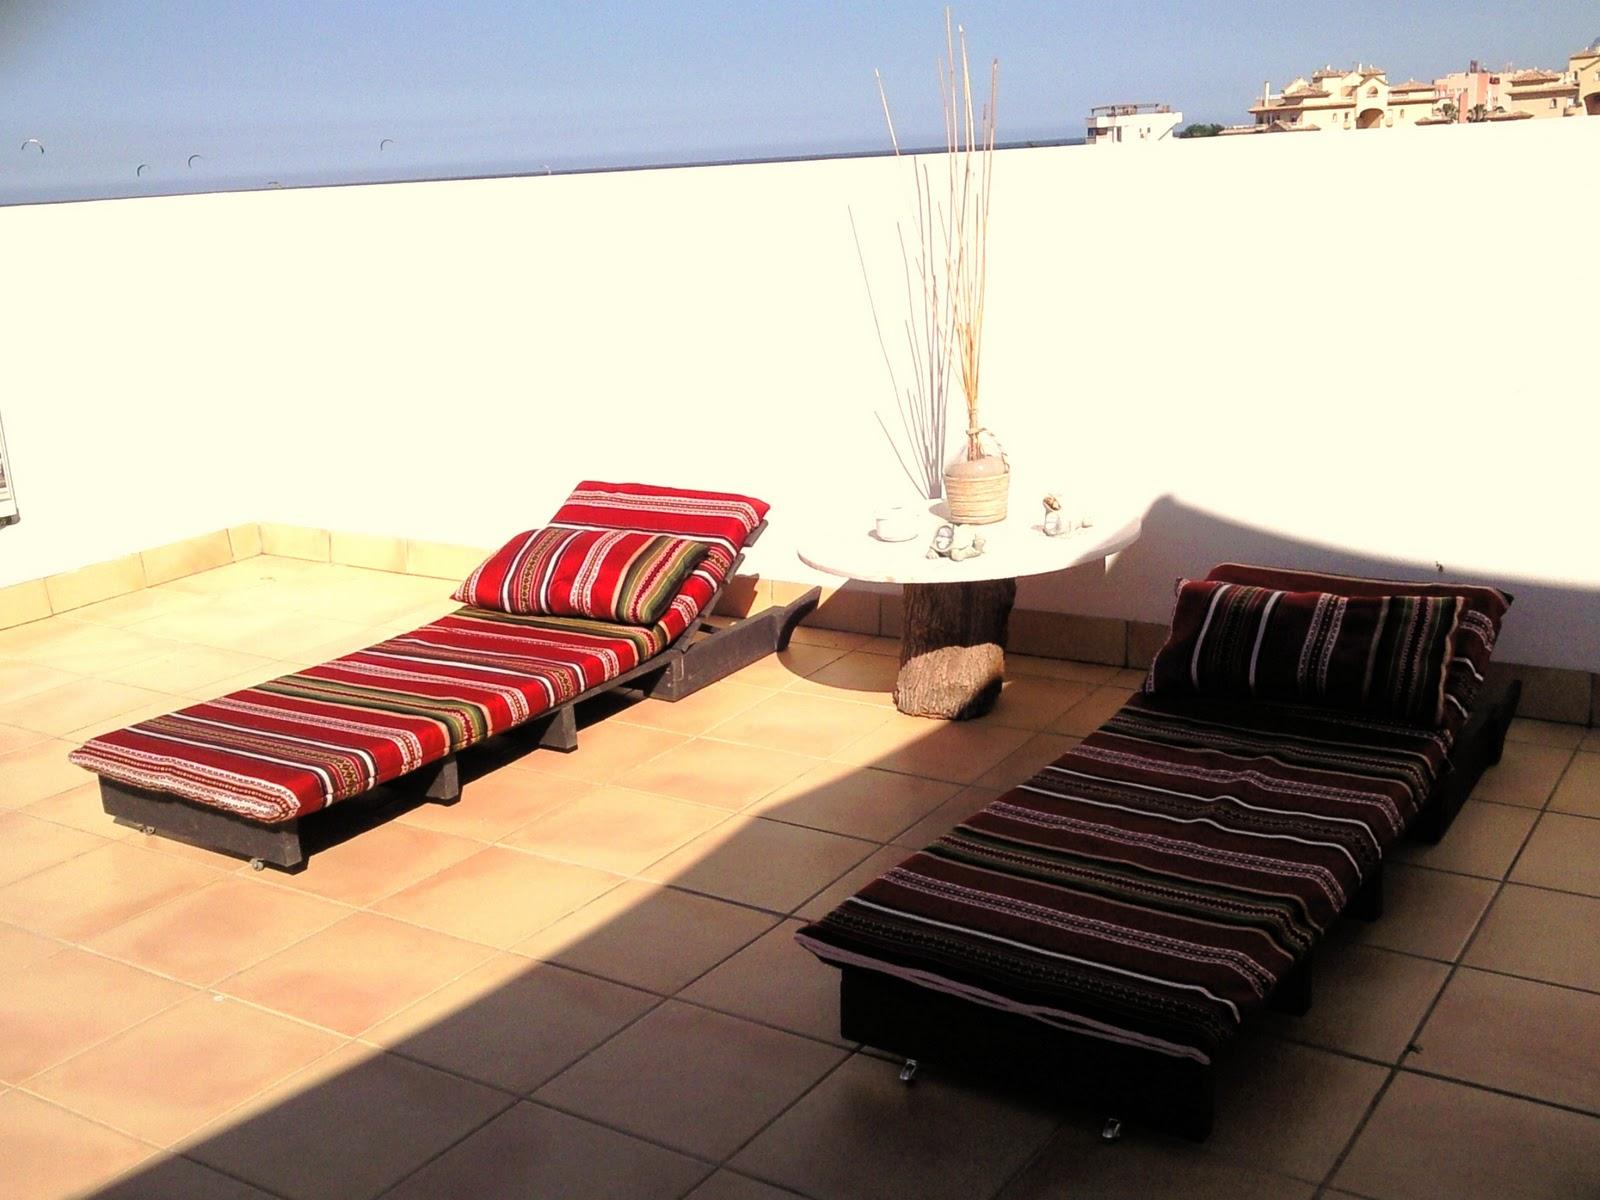 muebles de exterior tipo chill out. Black Bedroom Furniture Sets. Home Design Ideas